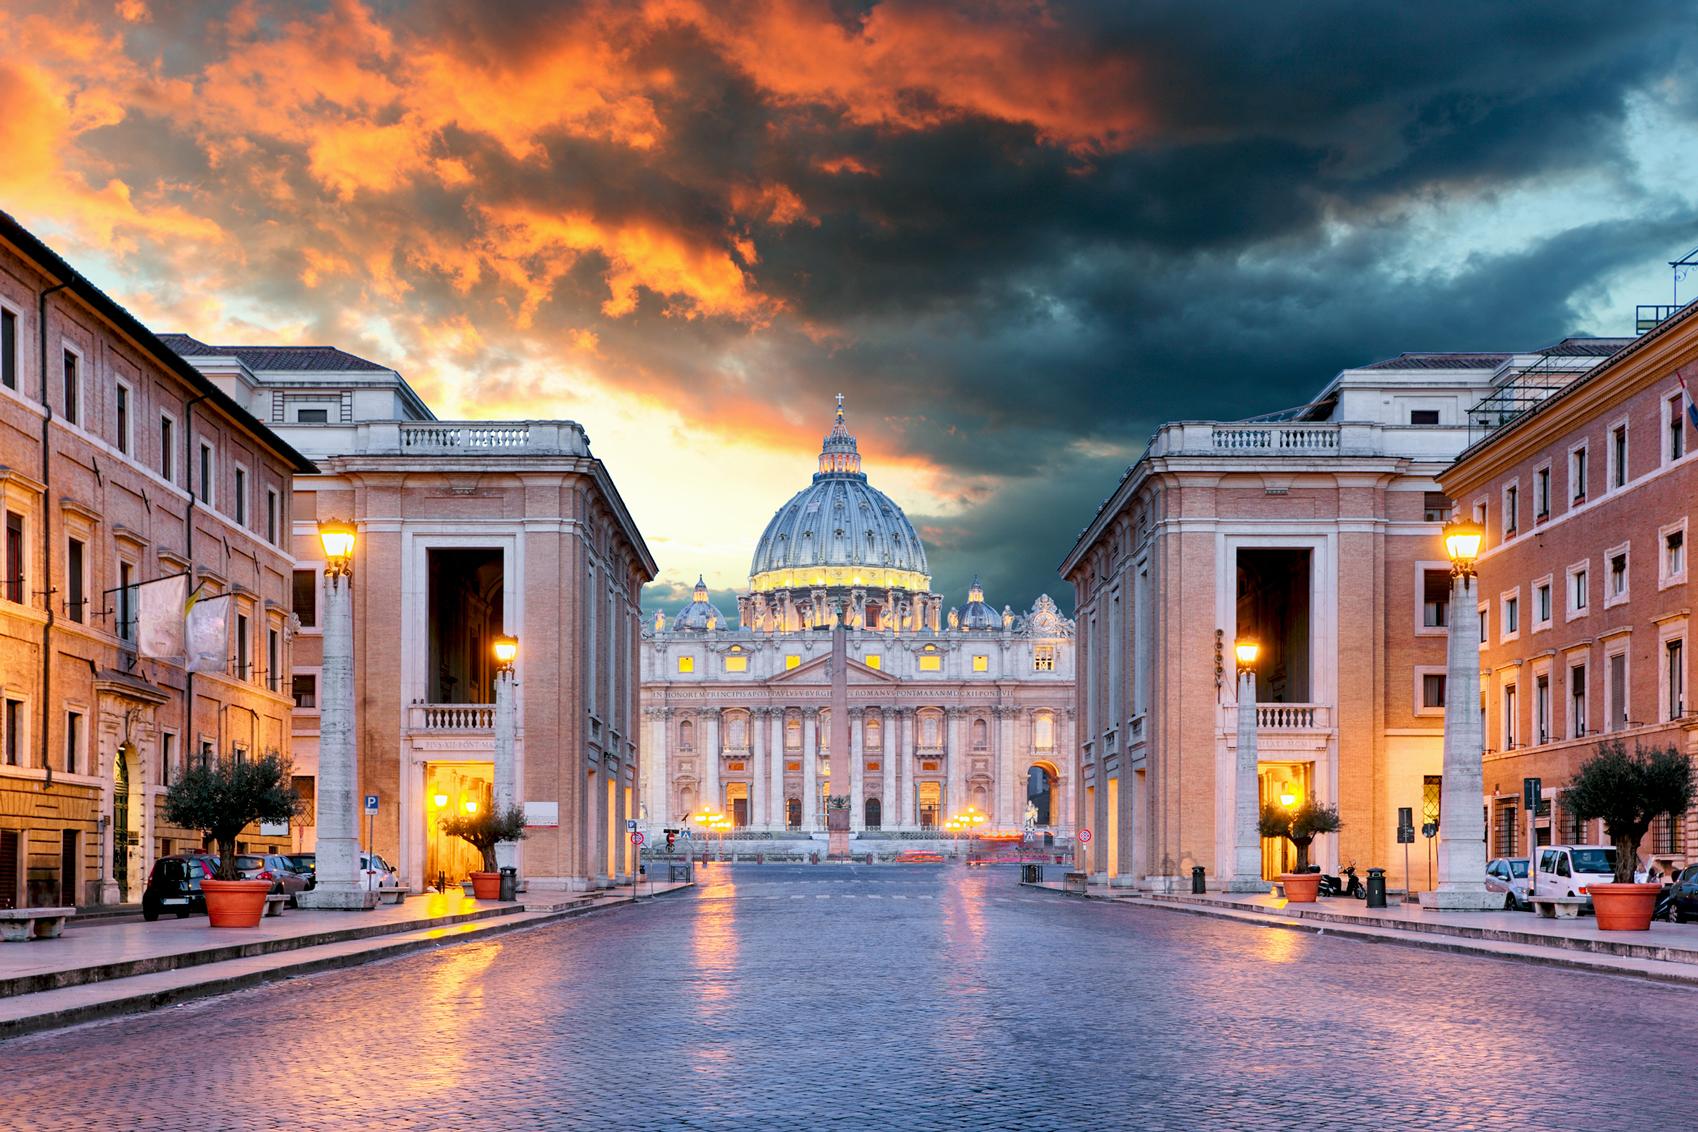 Sights in Italy Vatican-Rome-www.istockphoto.comgbphotovatican-rome-conciliazione-street-gm545788190-98482865-TomasSereda